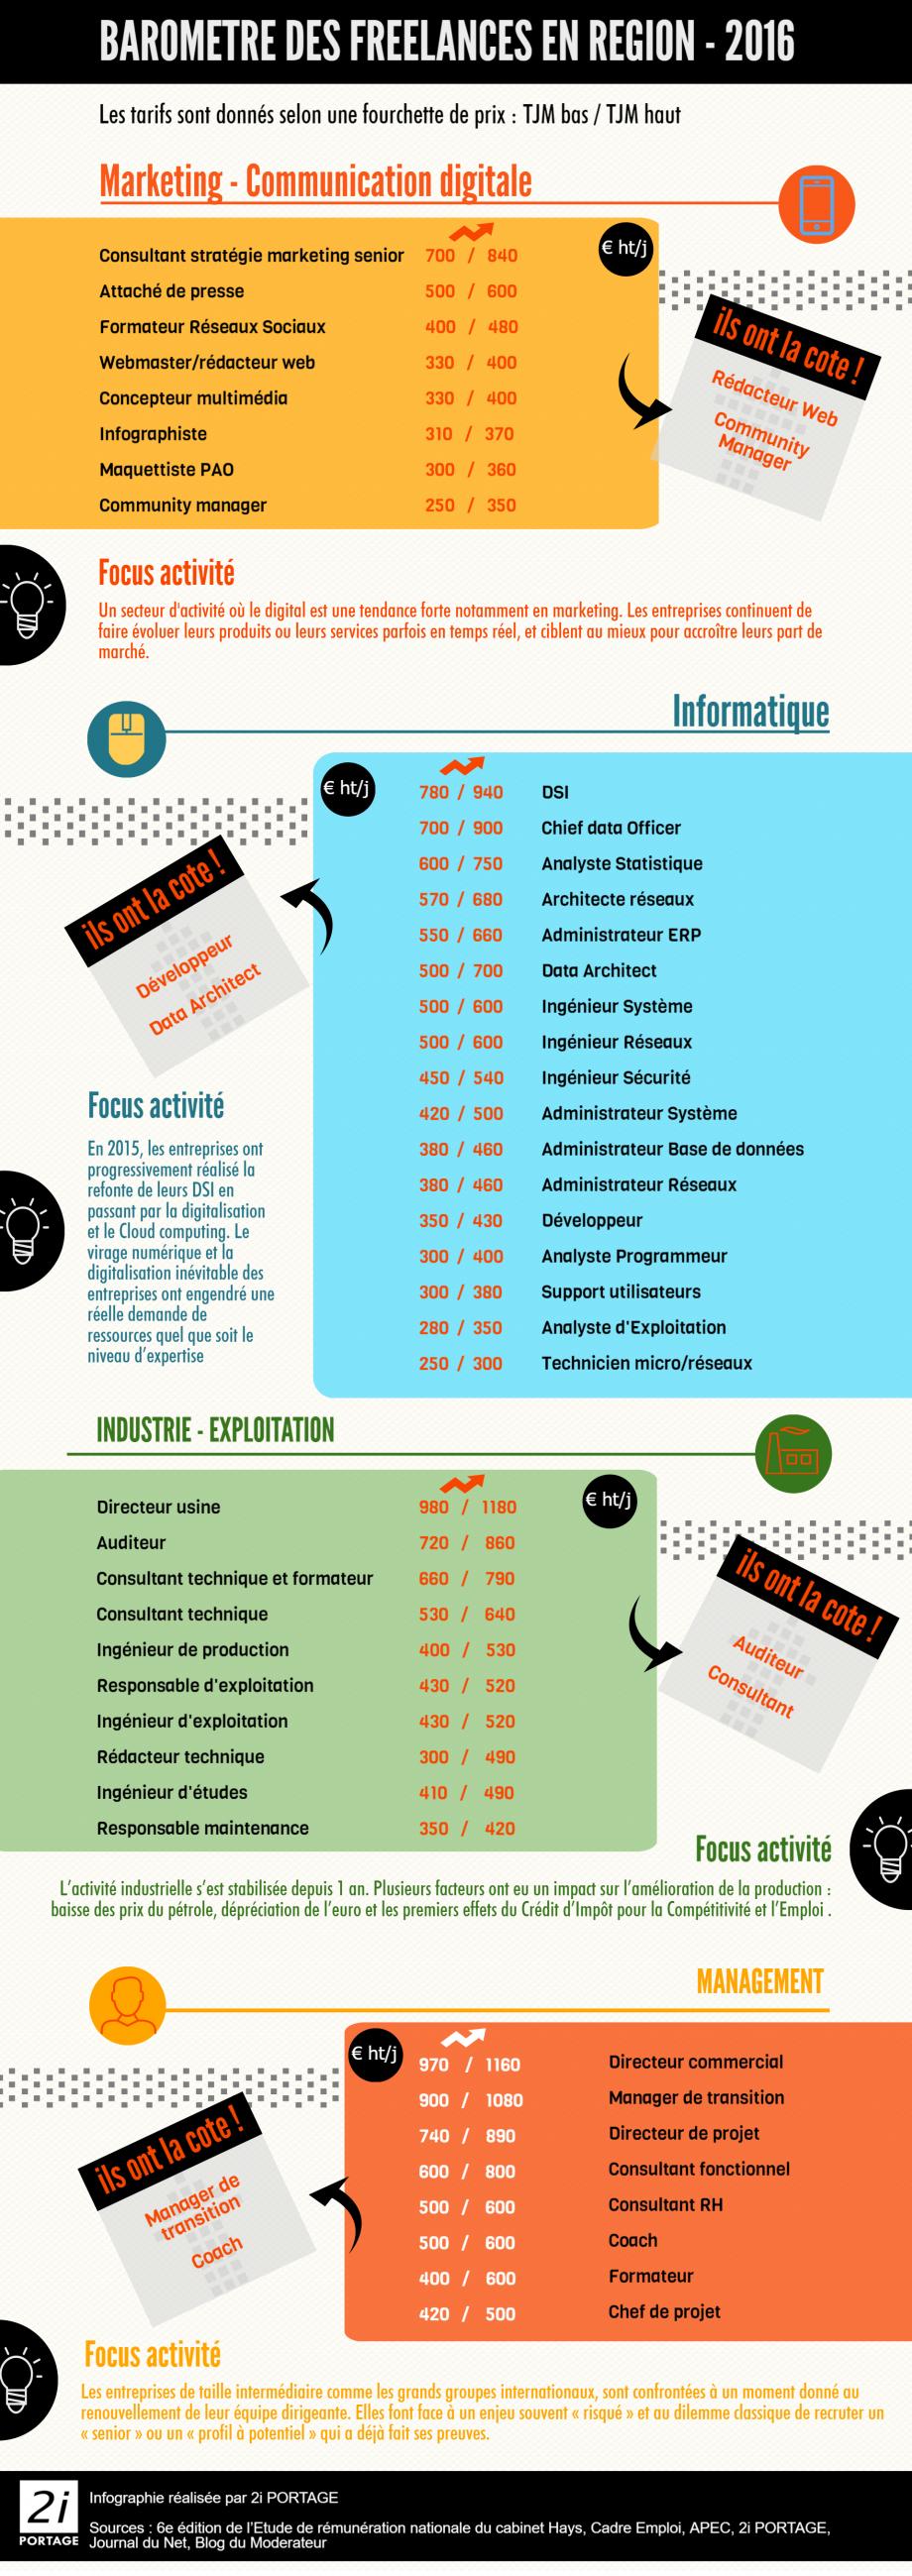 barometre_freelance_consultant